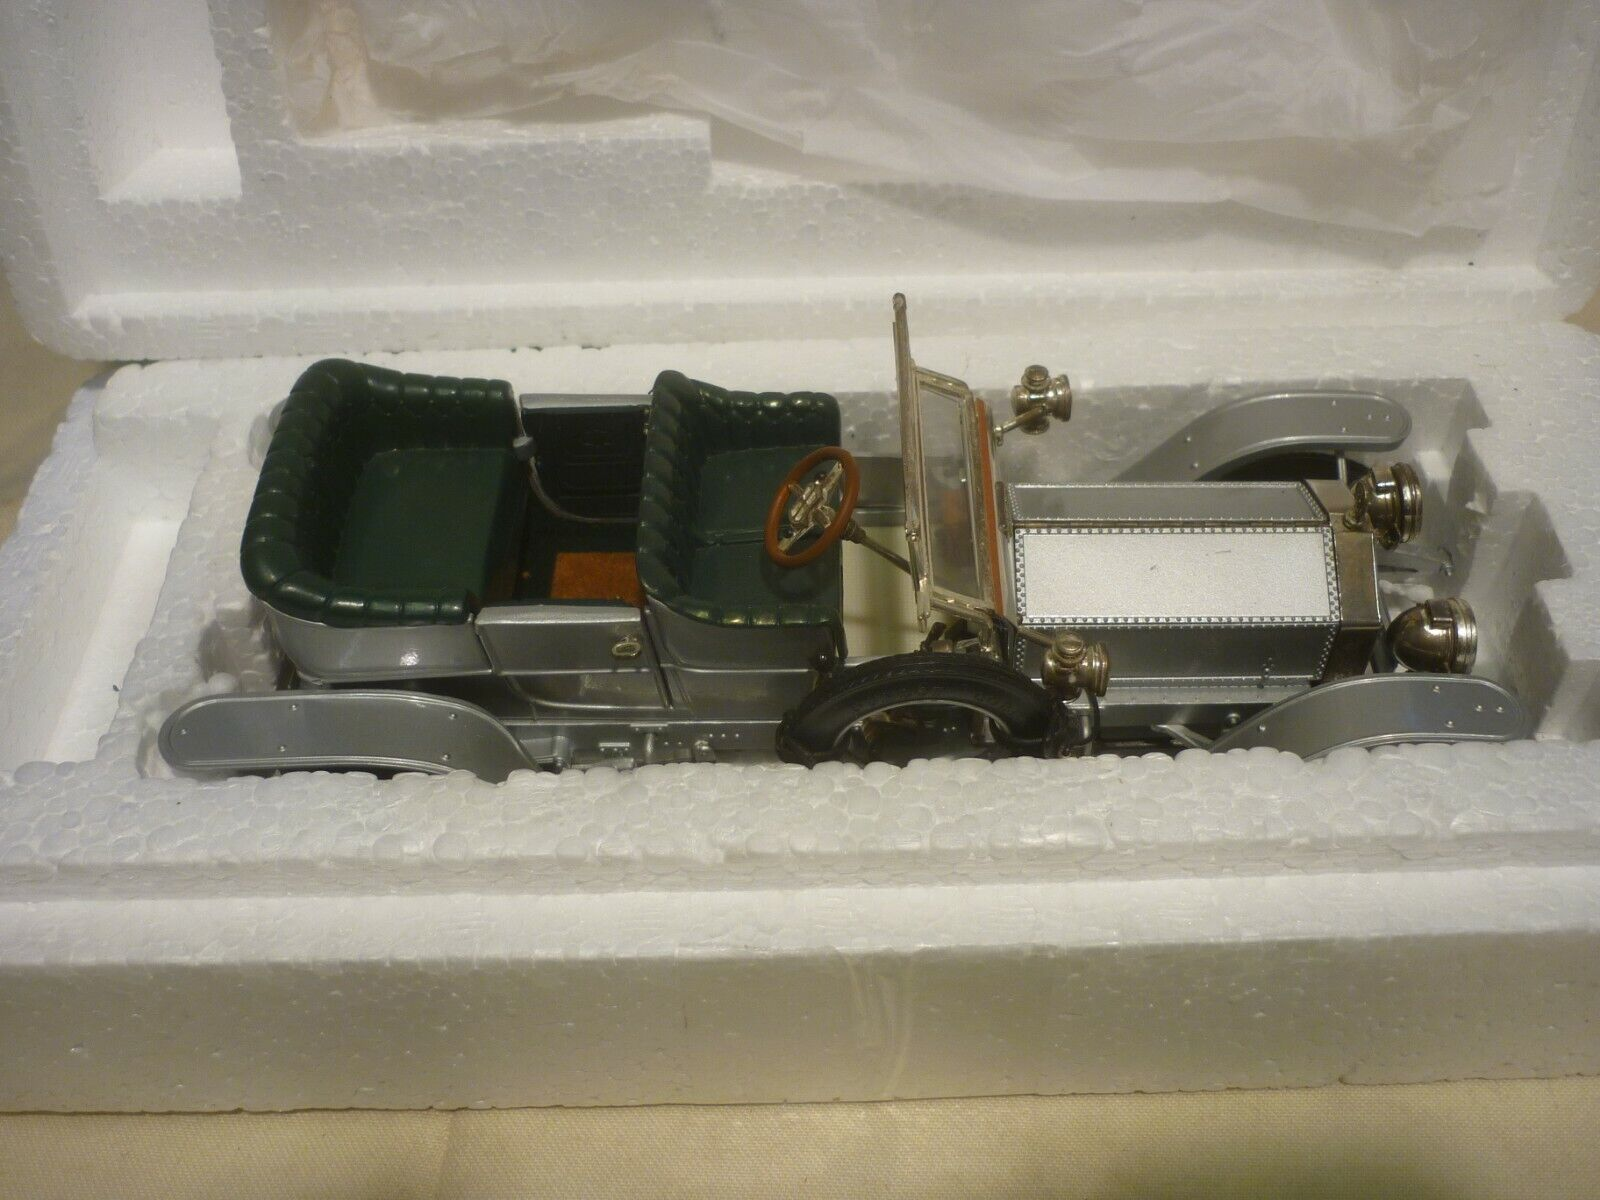 Un modelo de escala Franklin Mint de un 1907 Rolls Royce Fantasma De argento, En Caja